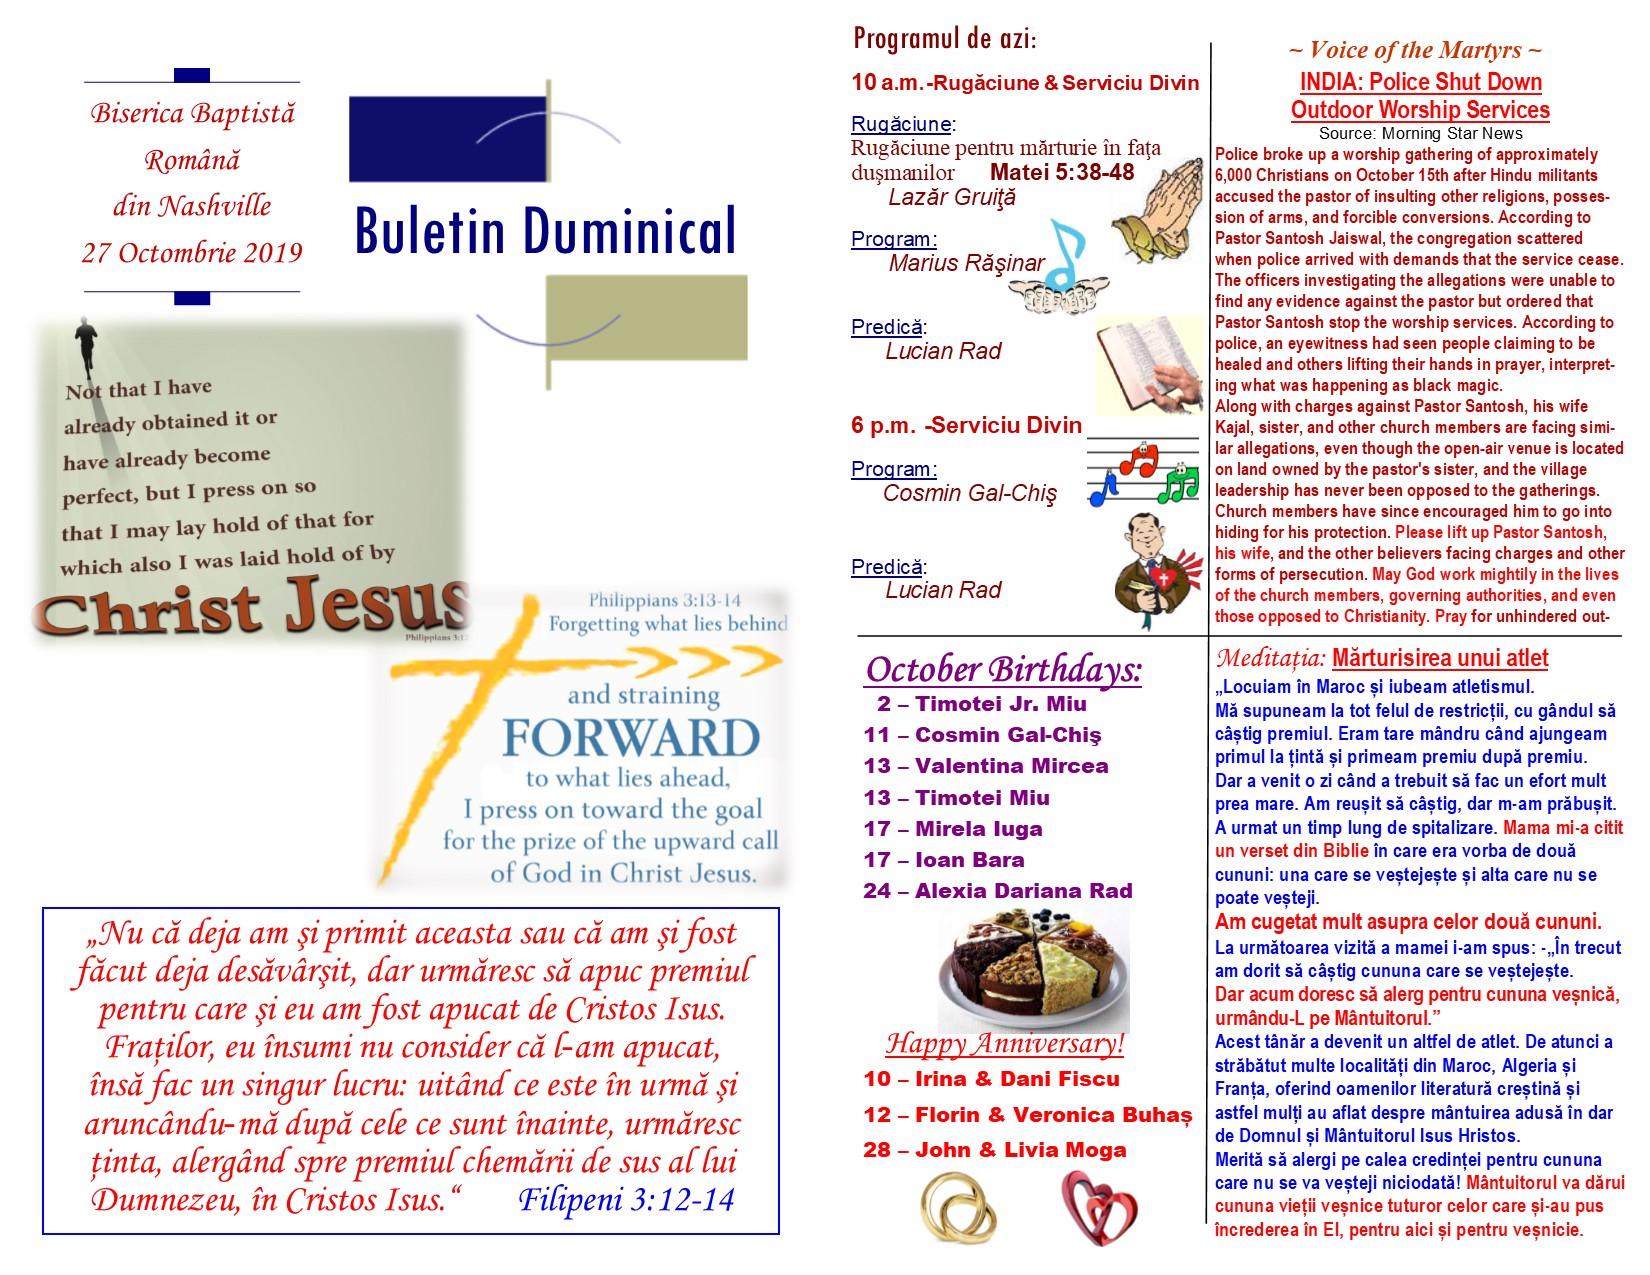 Buletin 10-27-19 page 1 & 2